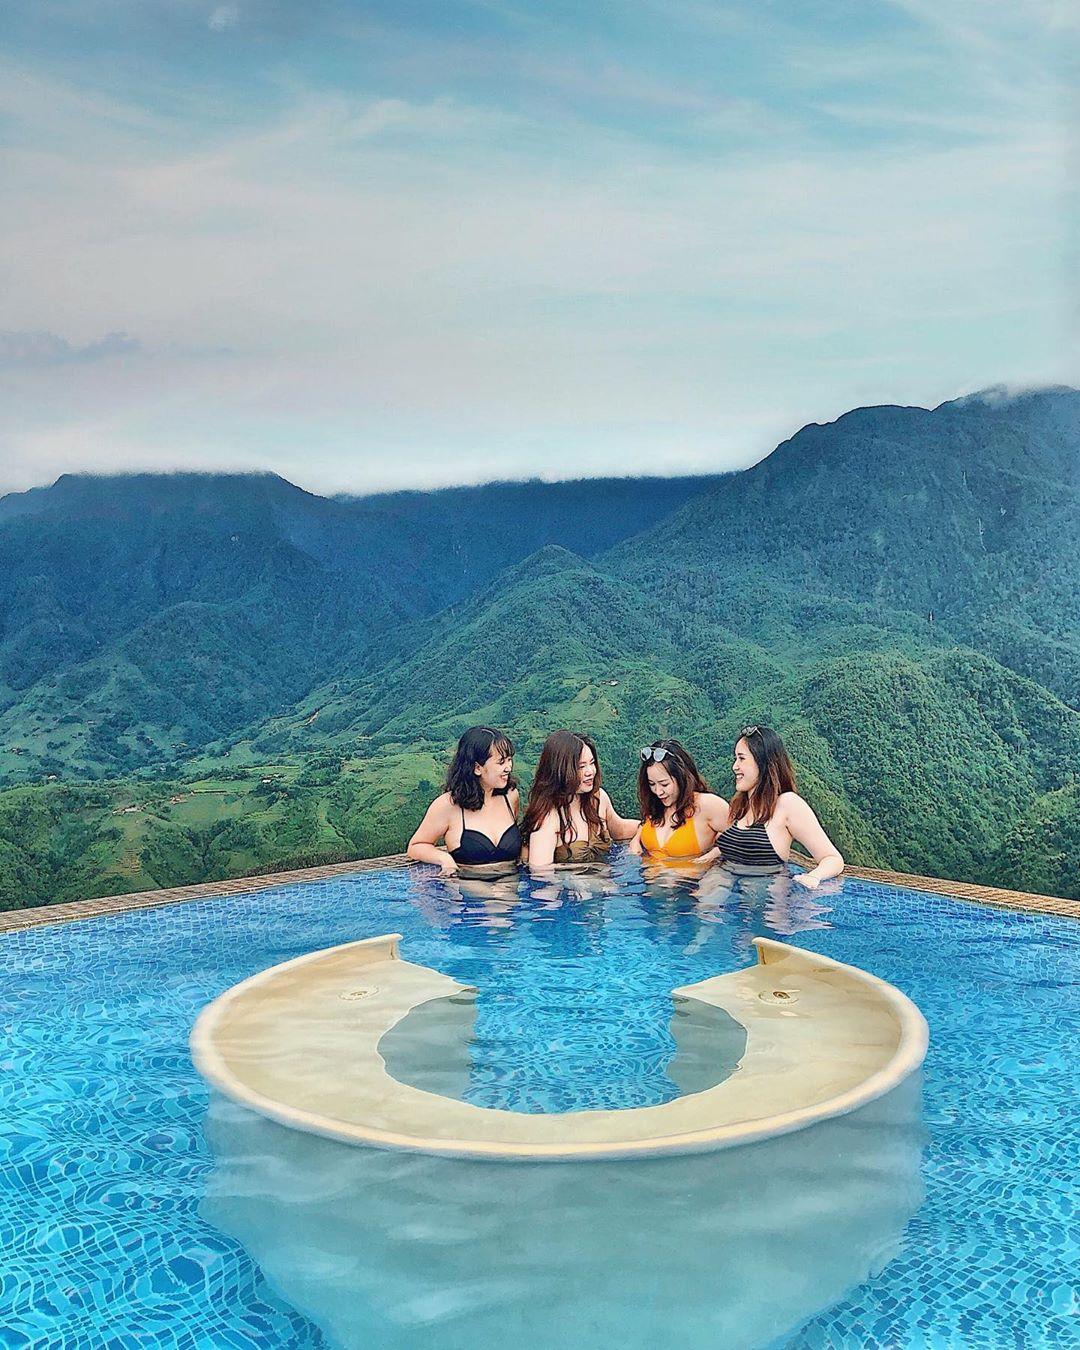 khach san resort 4 sao sapa